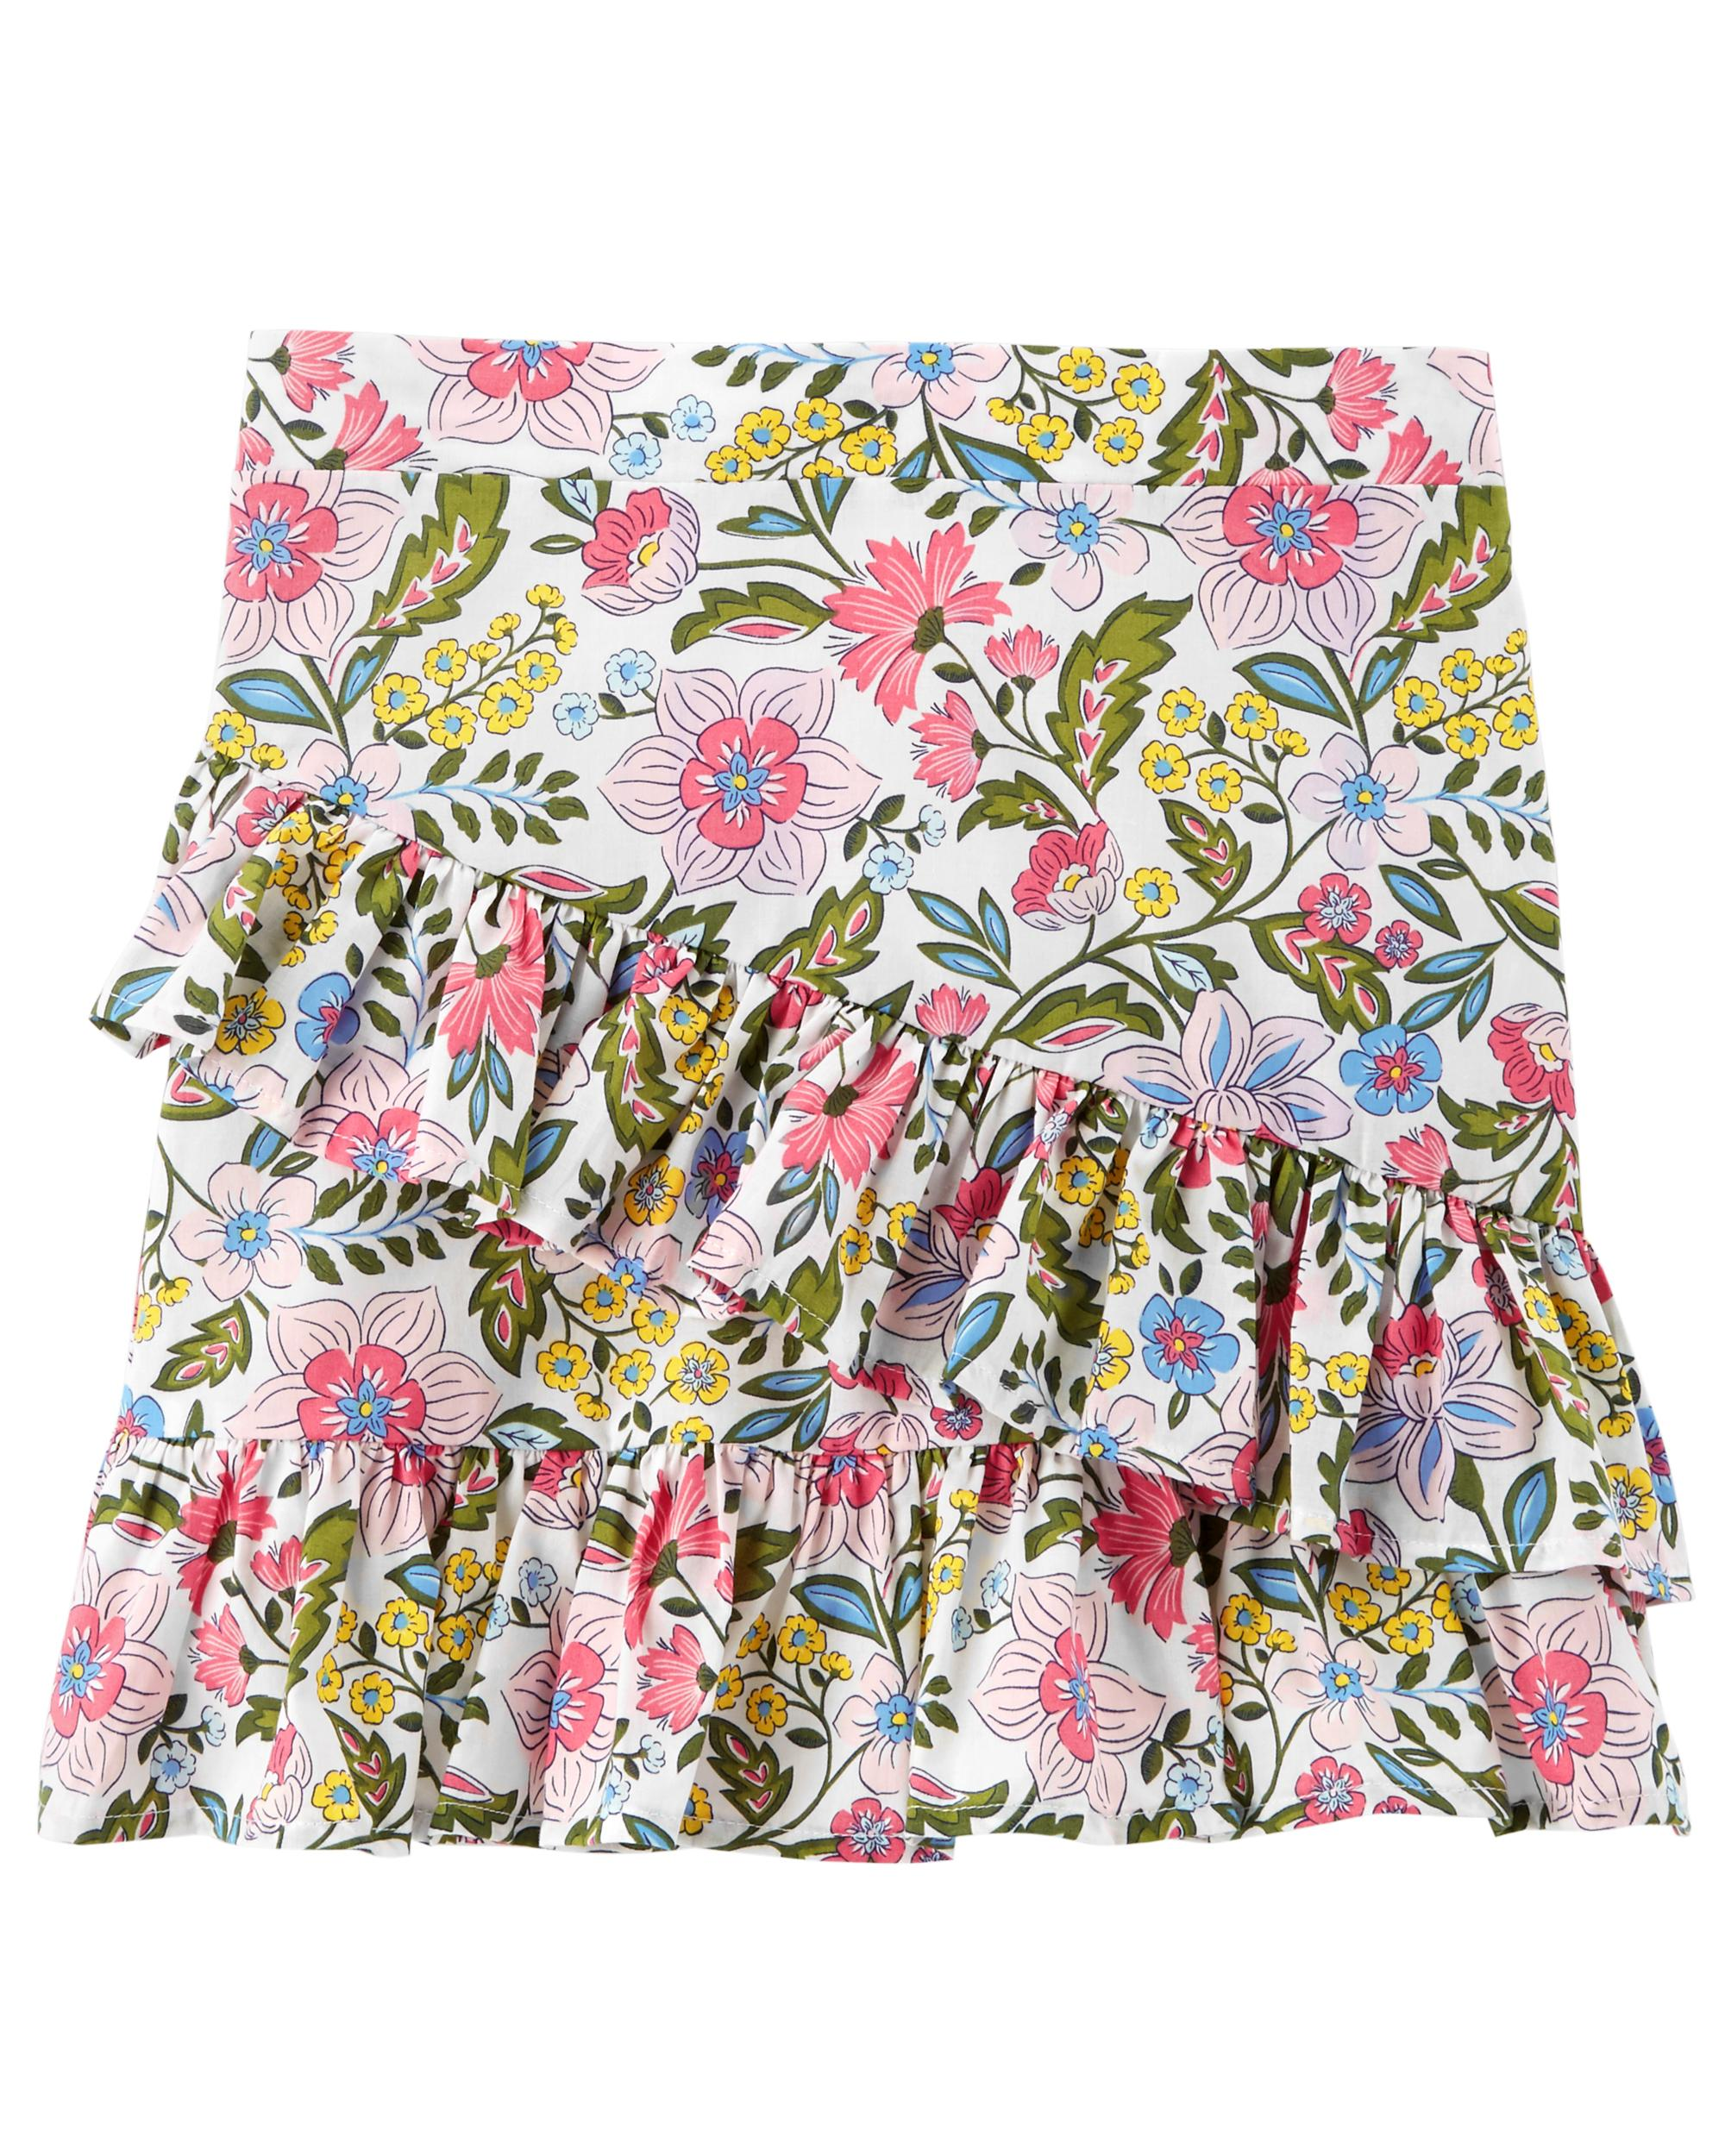 GUTTEAR Girls Kids Fly Sleeve Solid Pearl Party Princess Wedding Dress